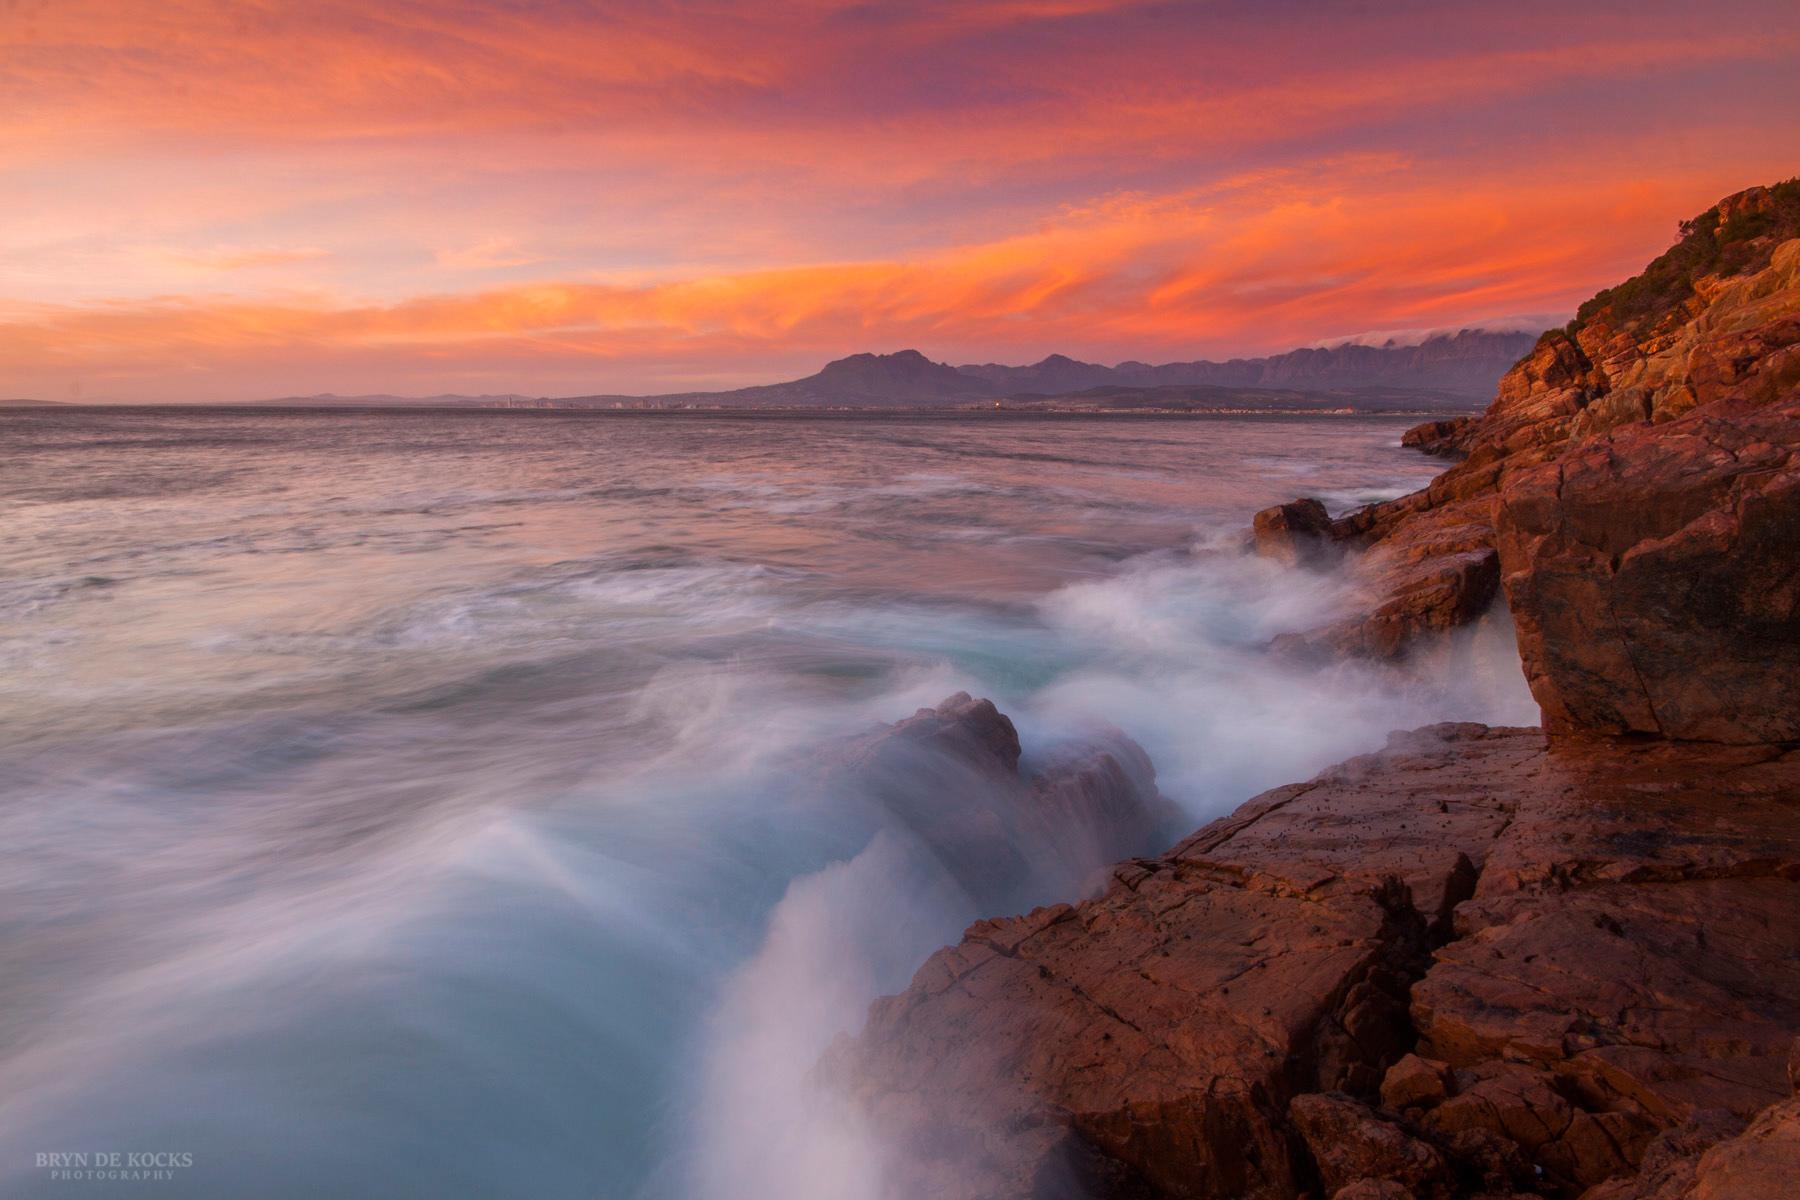 Vibrant Sunset near Gordon's Bay